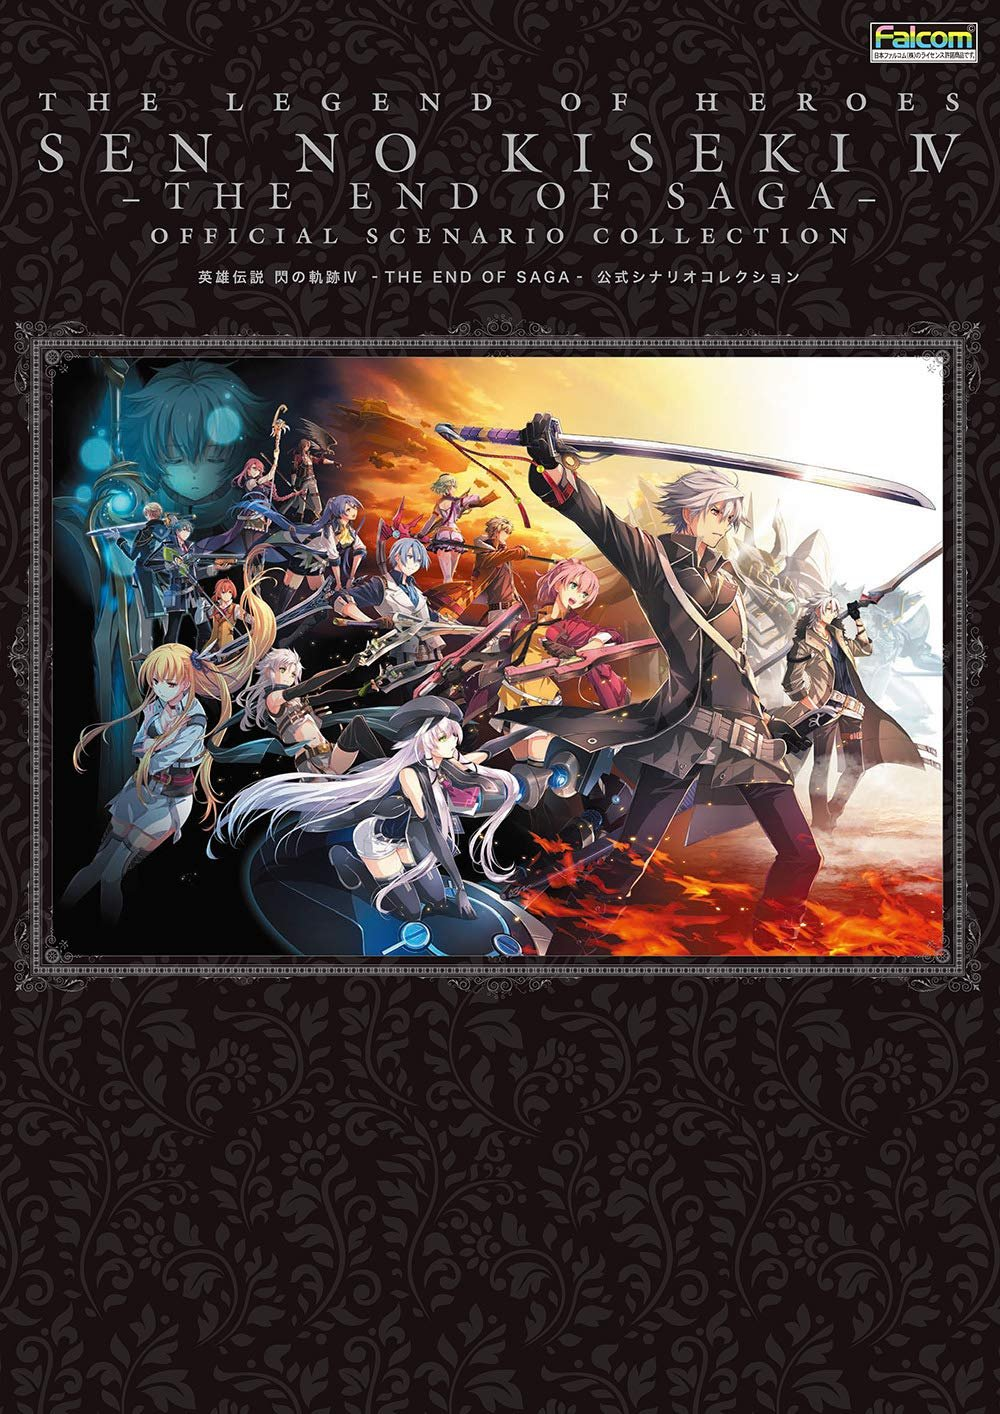 Legend of Heroes: Sen no Kiseki IV -THE END OF SAGA- Official Scenario Collection